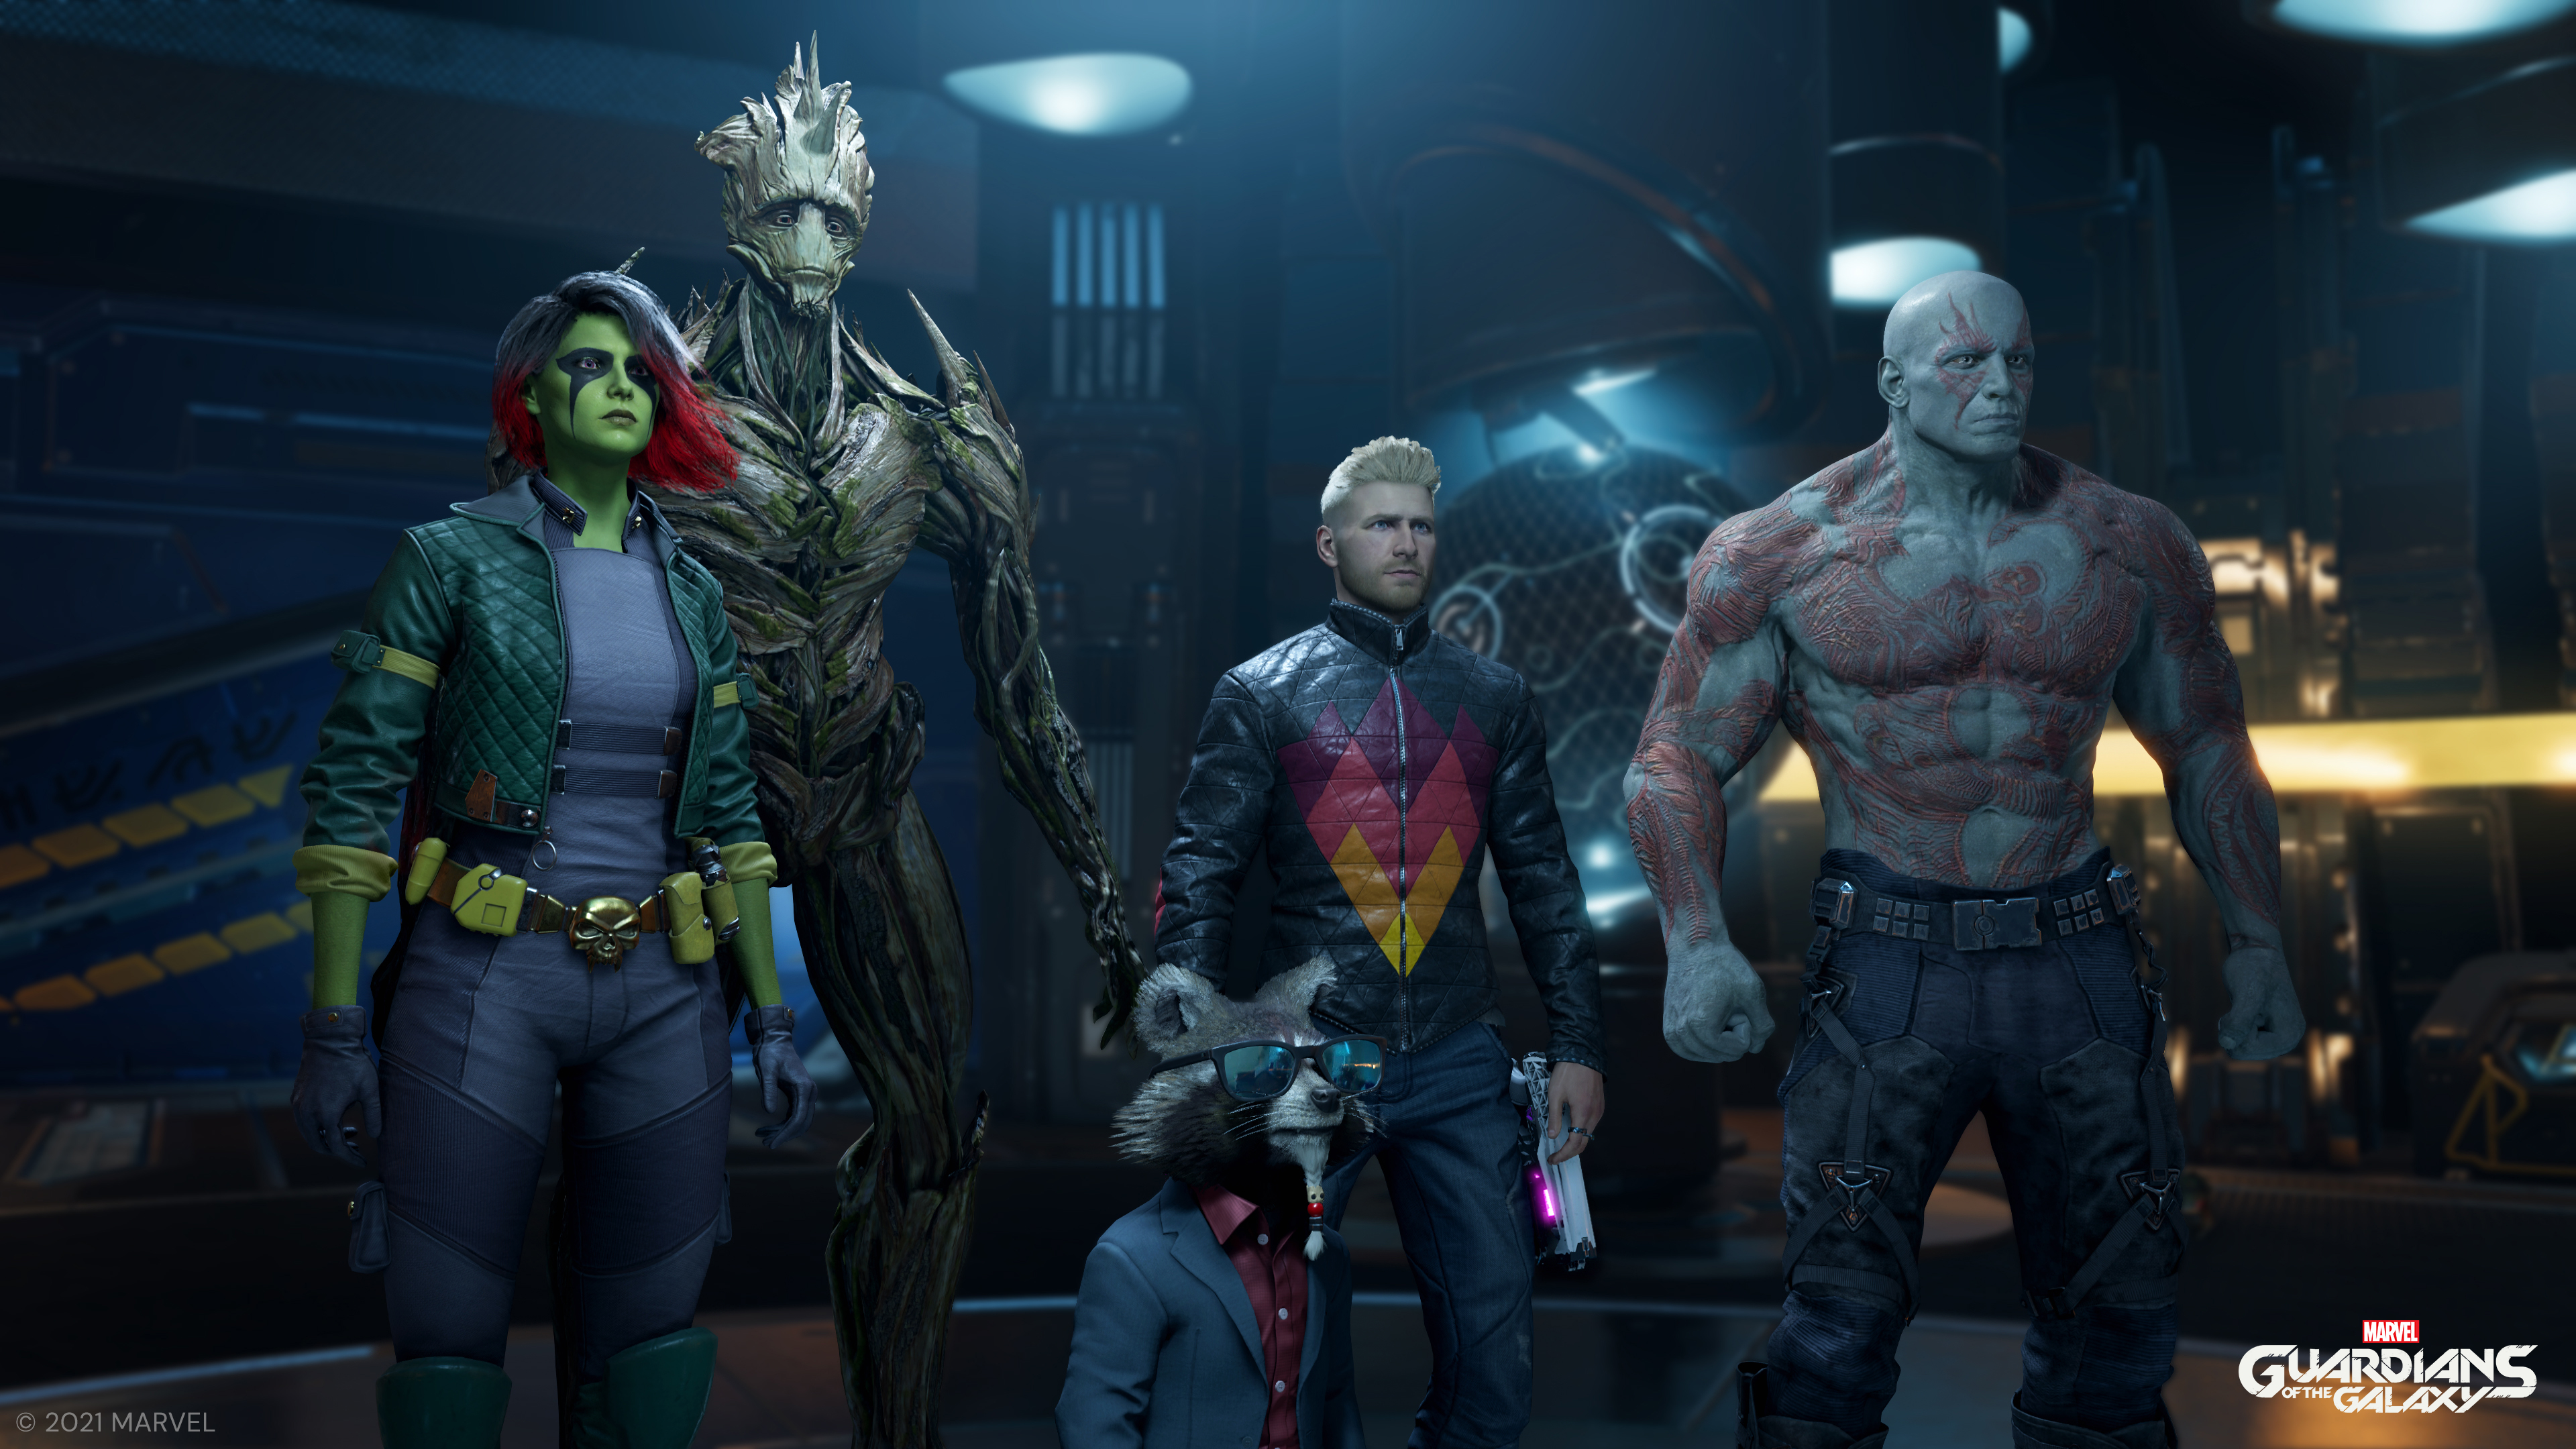 Les Gardiens de la Galaxie avec des tenues alternatives.